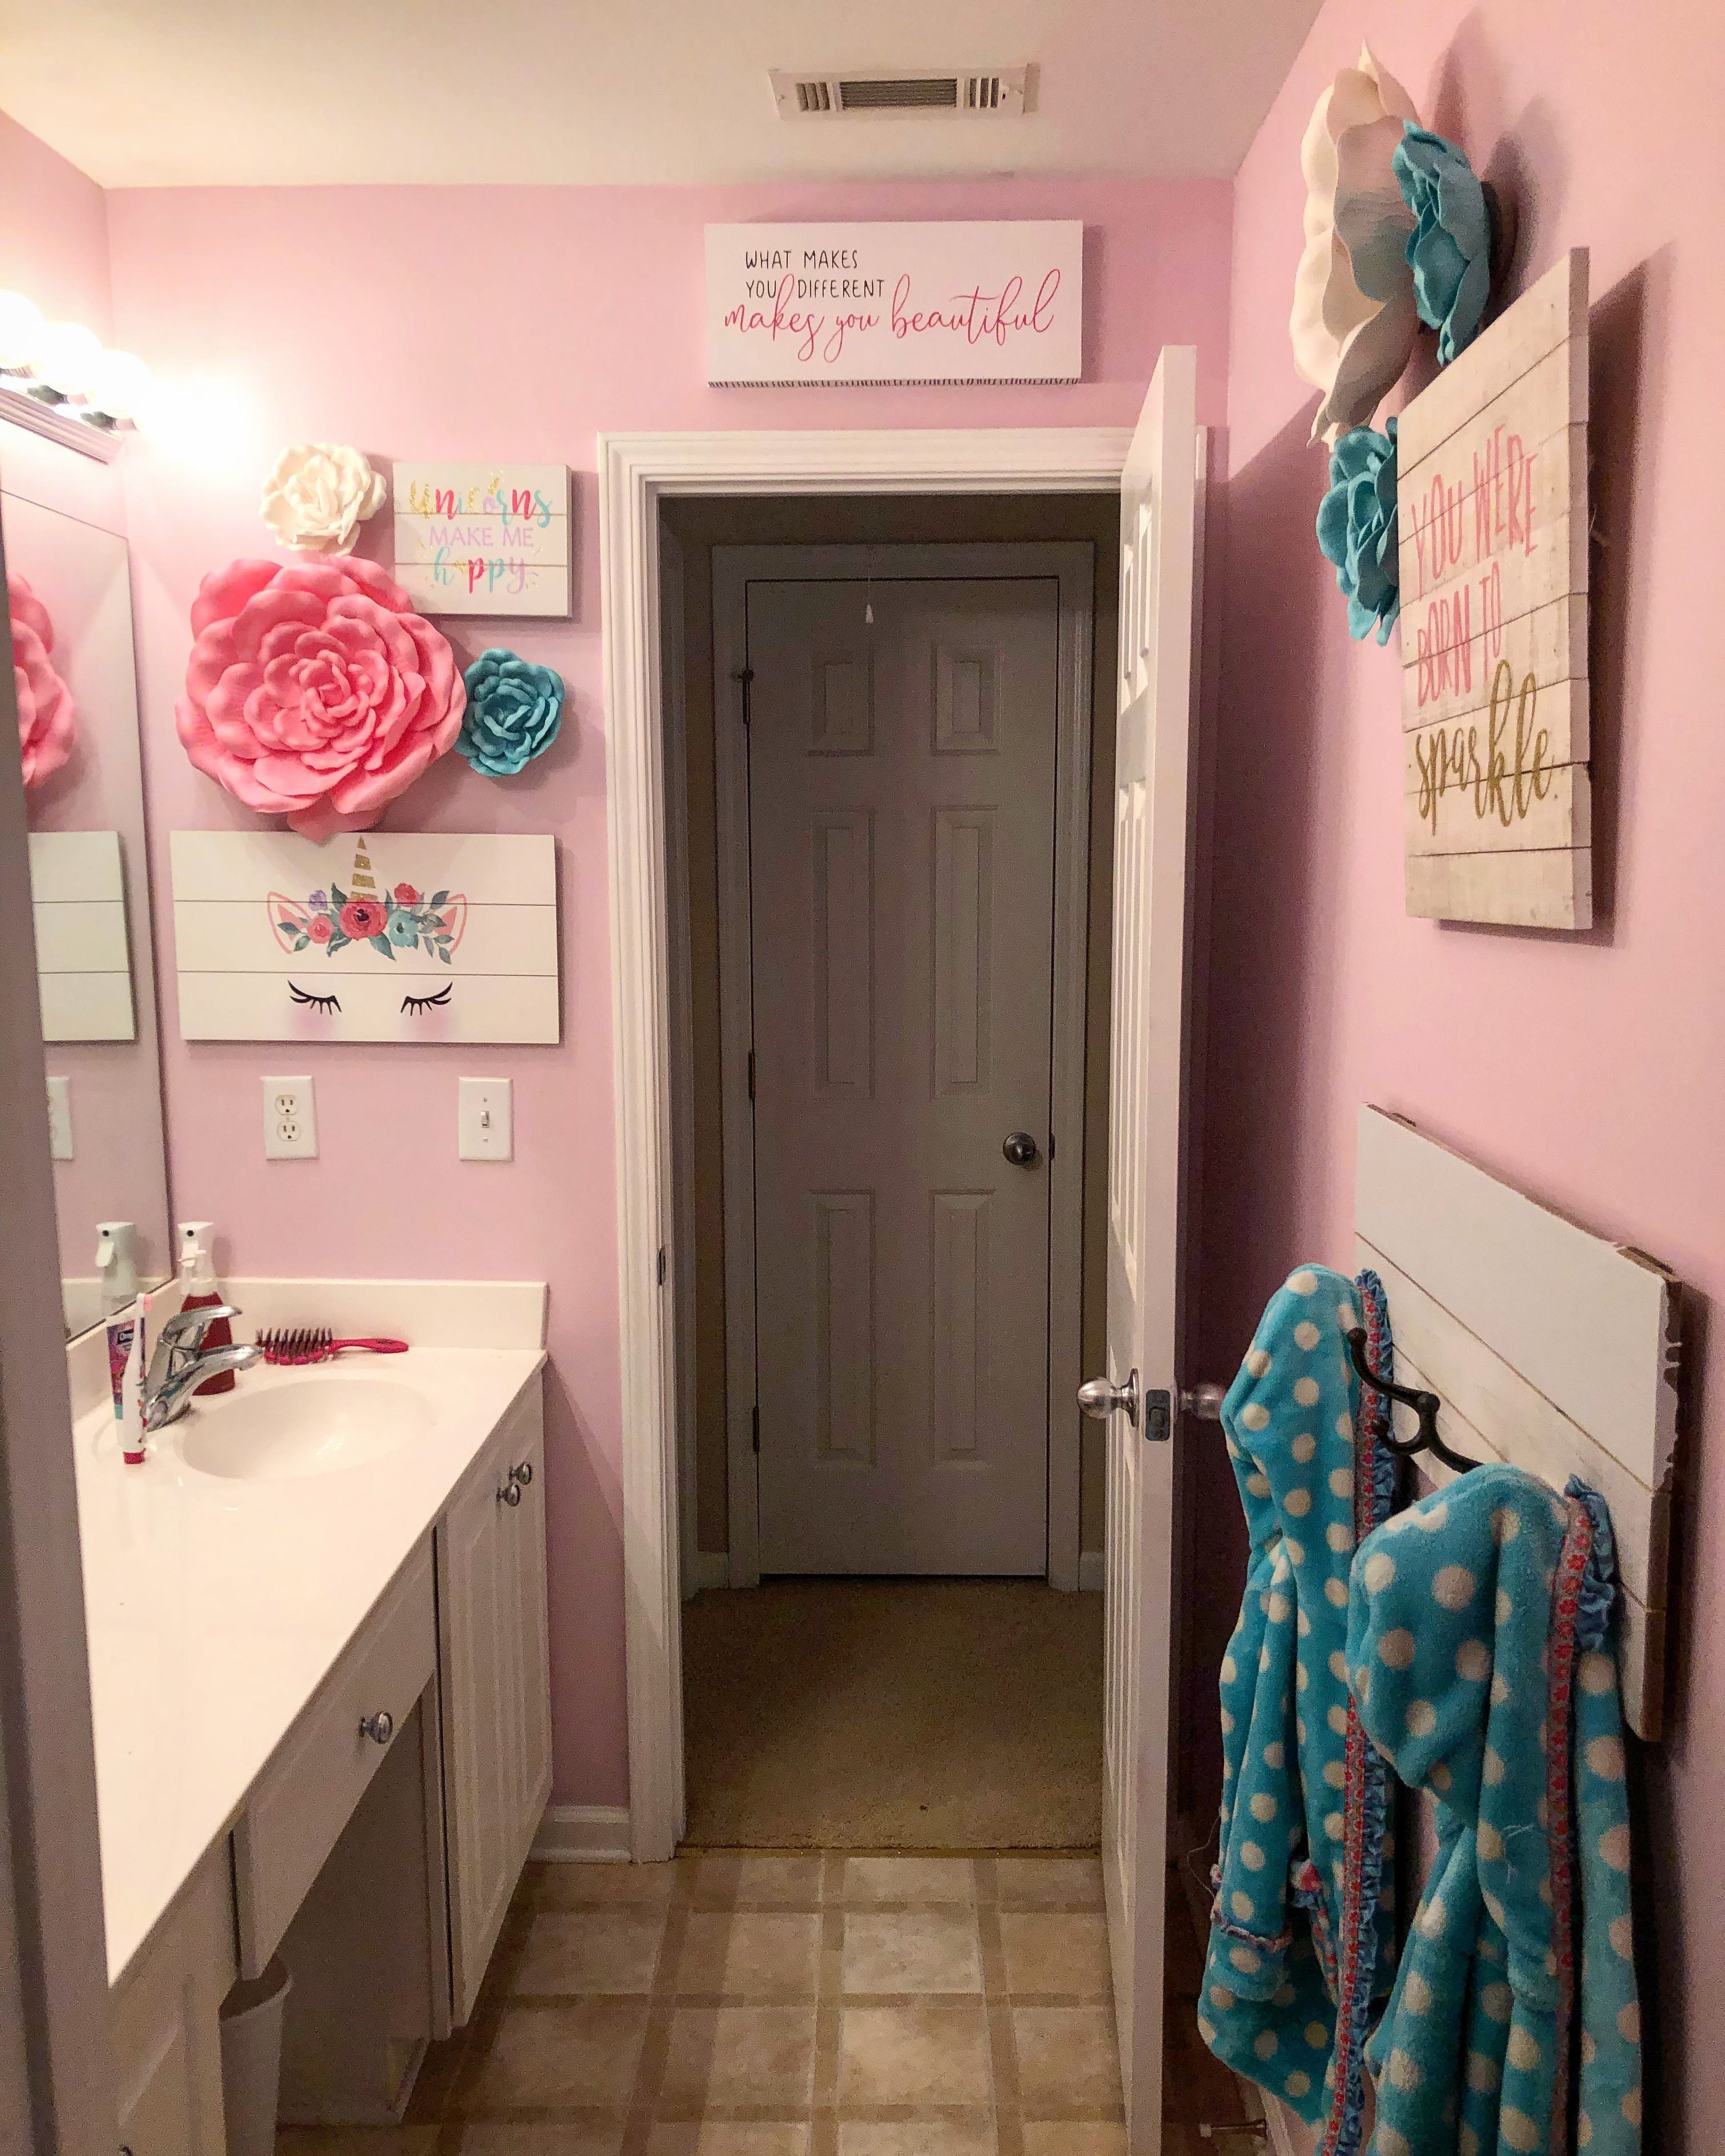 Girl Bathroom Decorating Ideas 2021 Girl Bathroom Decor Girl Bathrooms Girls Bathroom Feminine bathroom decorating ideas